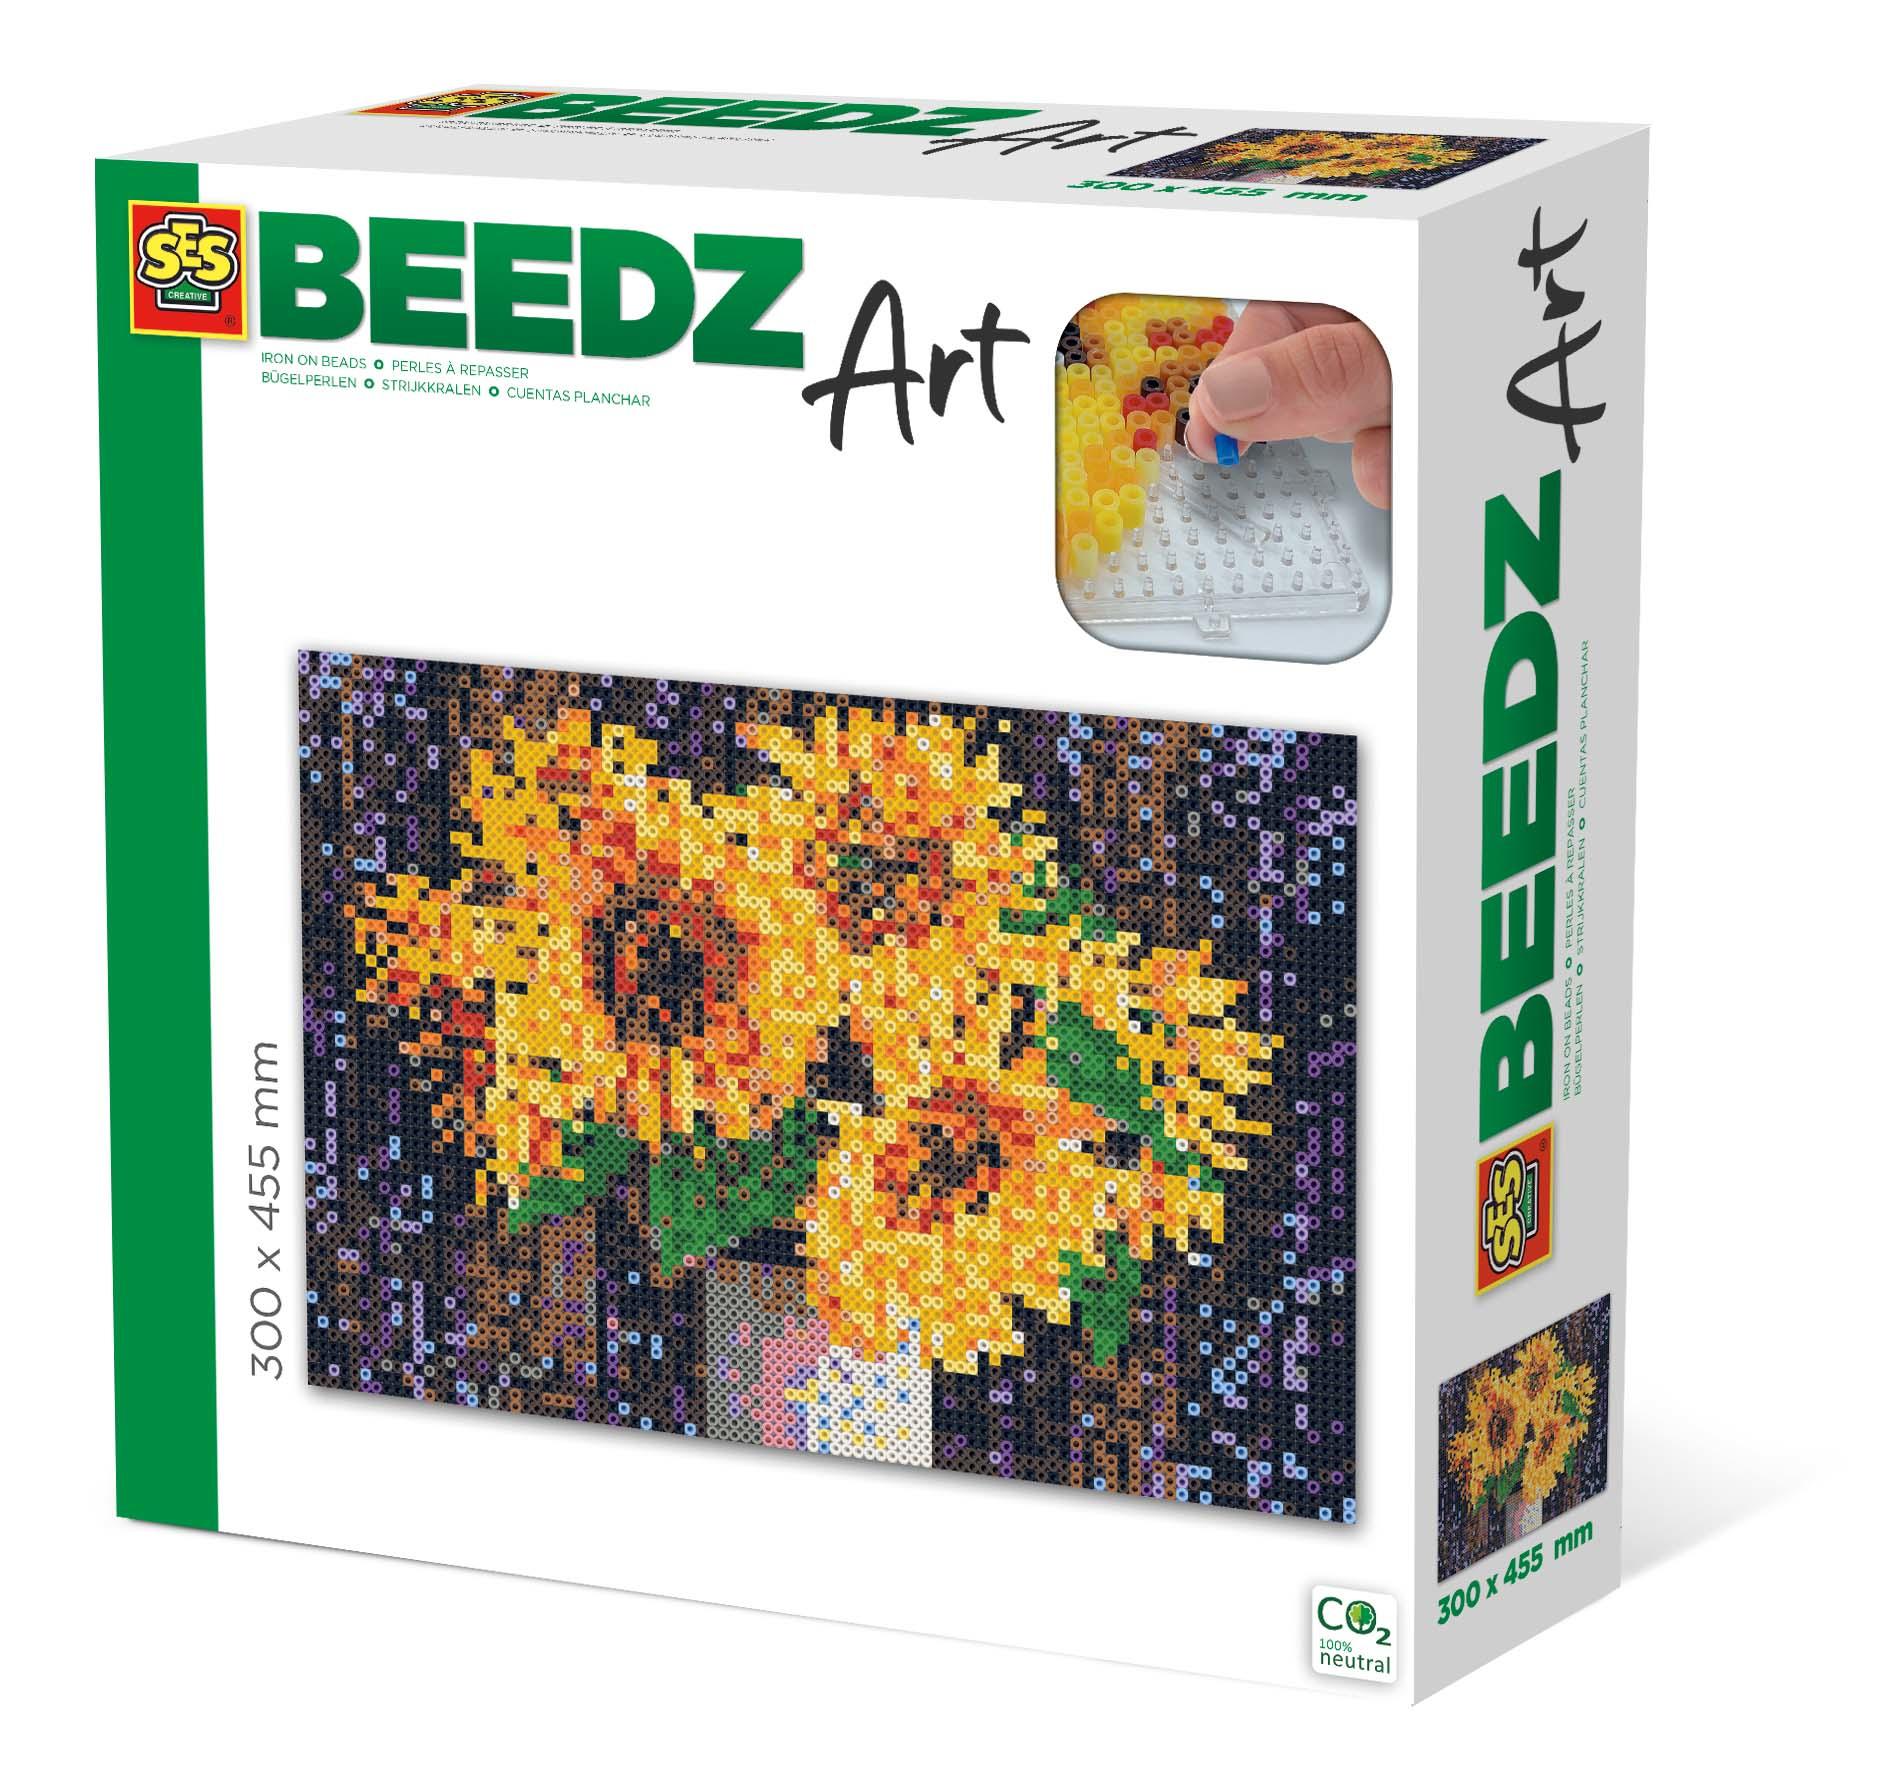 SES Creative Beedz art - Sunflowers